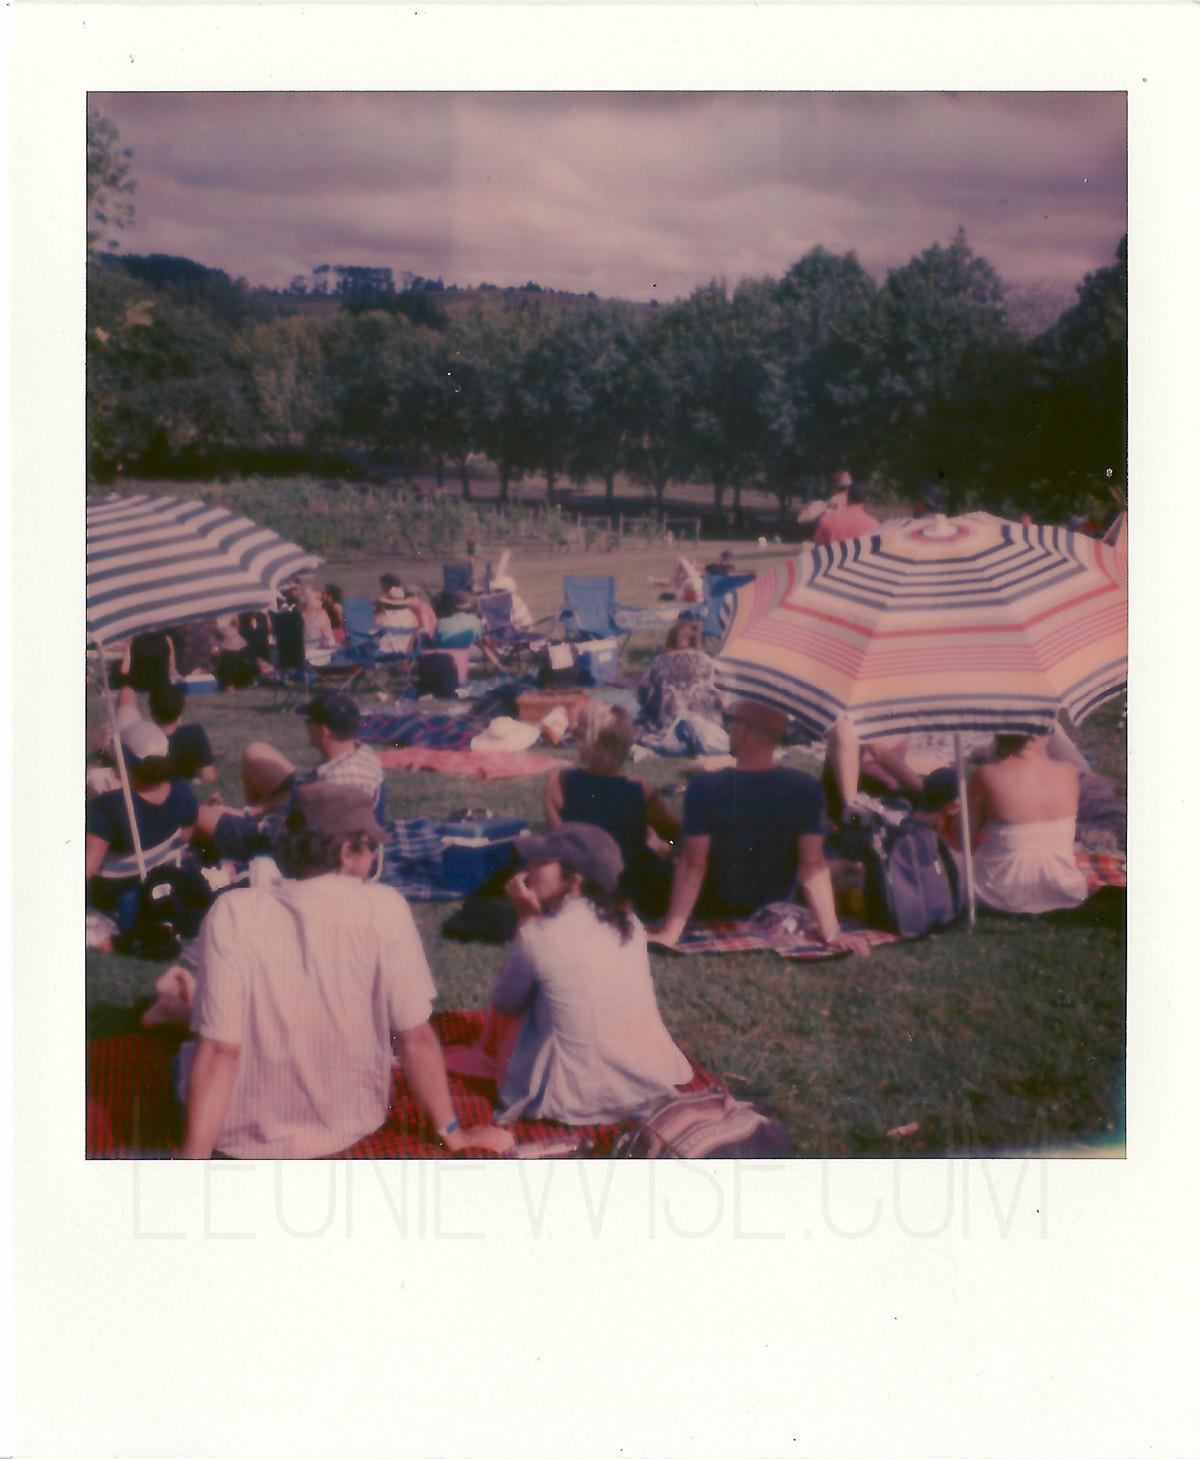 MusicAtMatua_Polaroid-SX70_Impossible-PX70_leoniewise-3